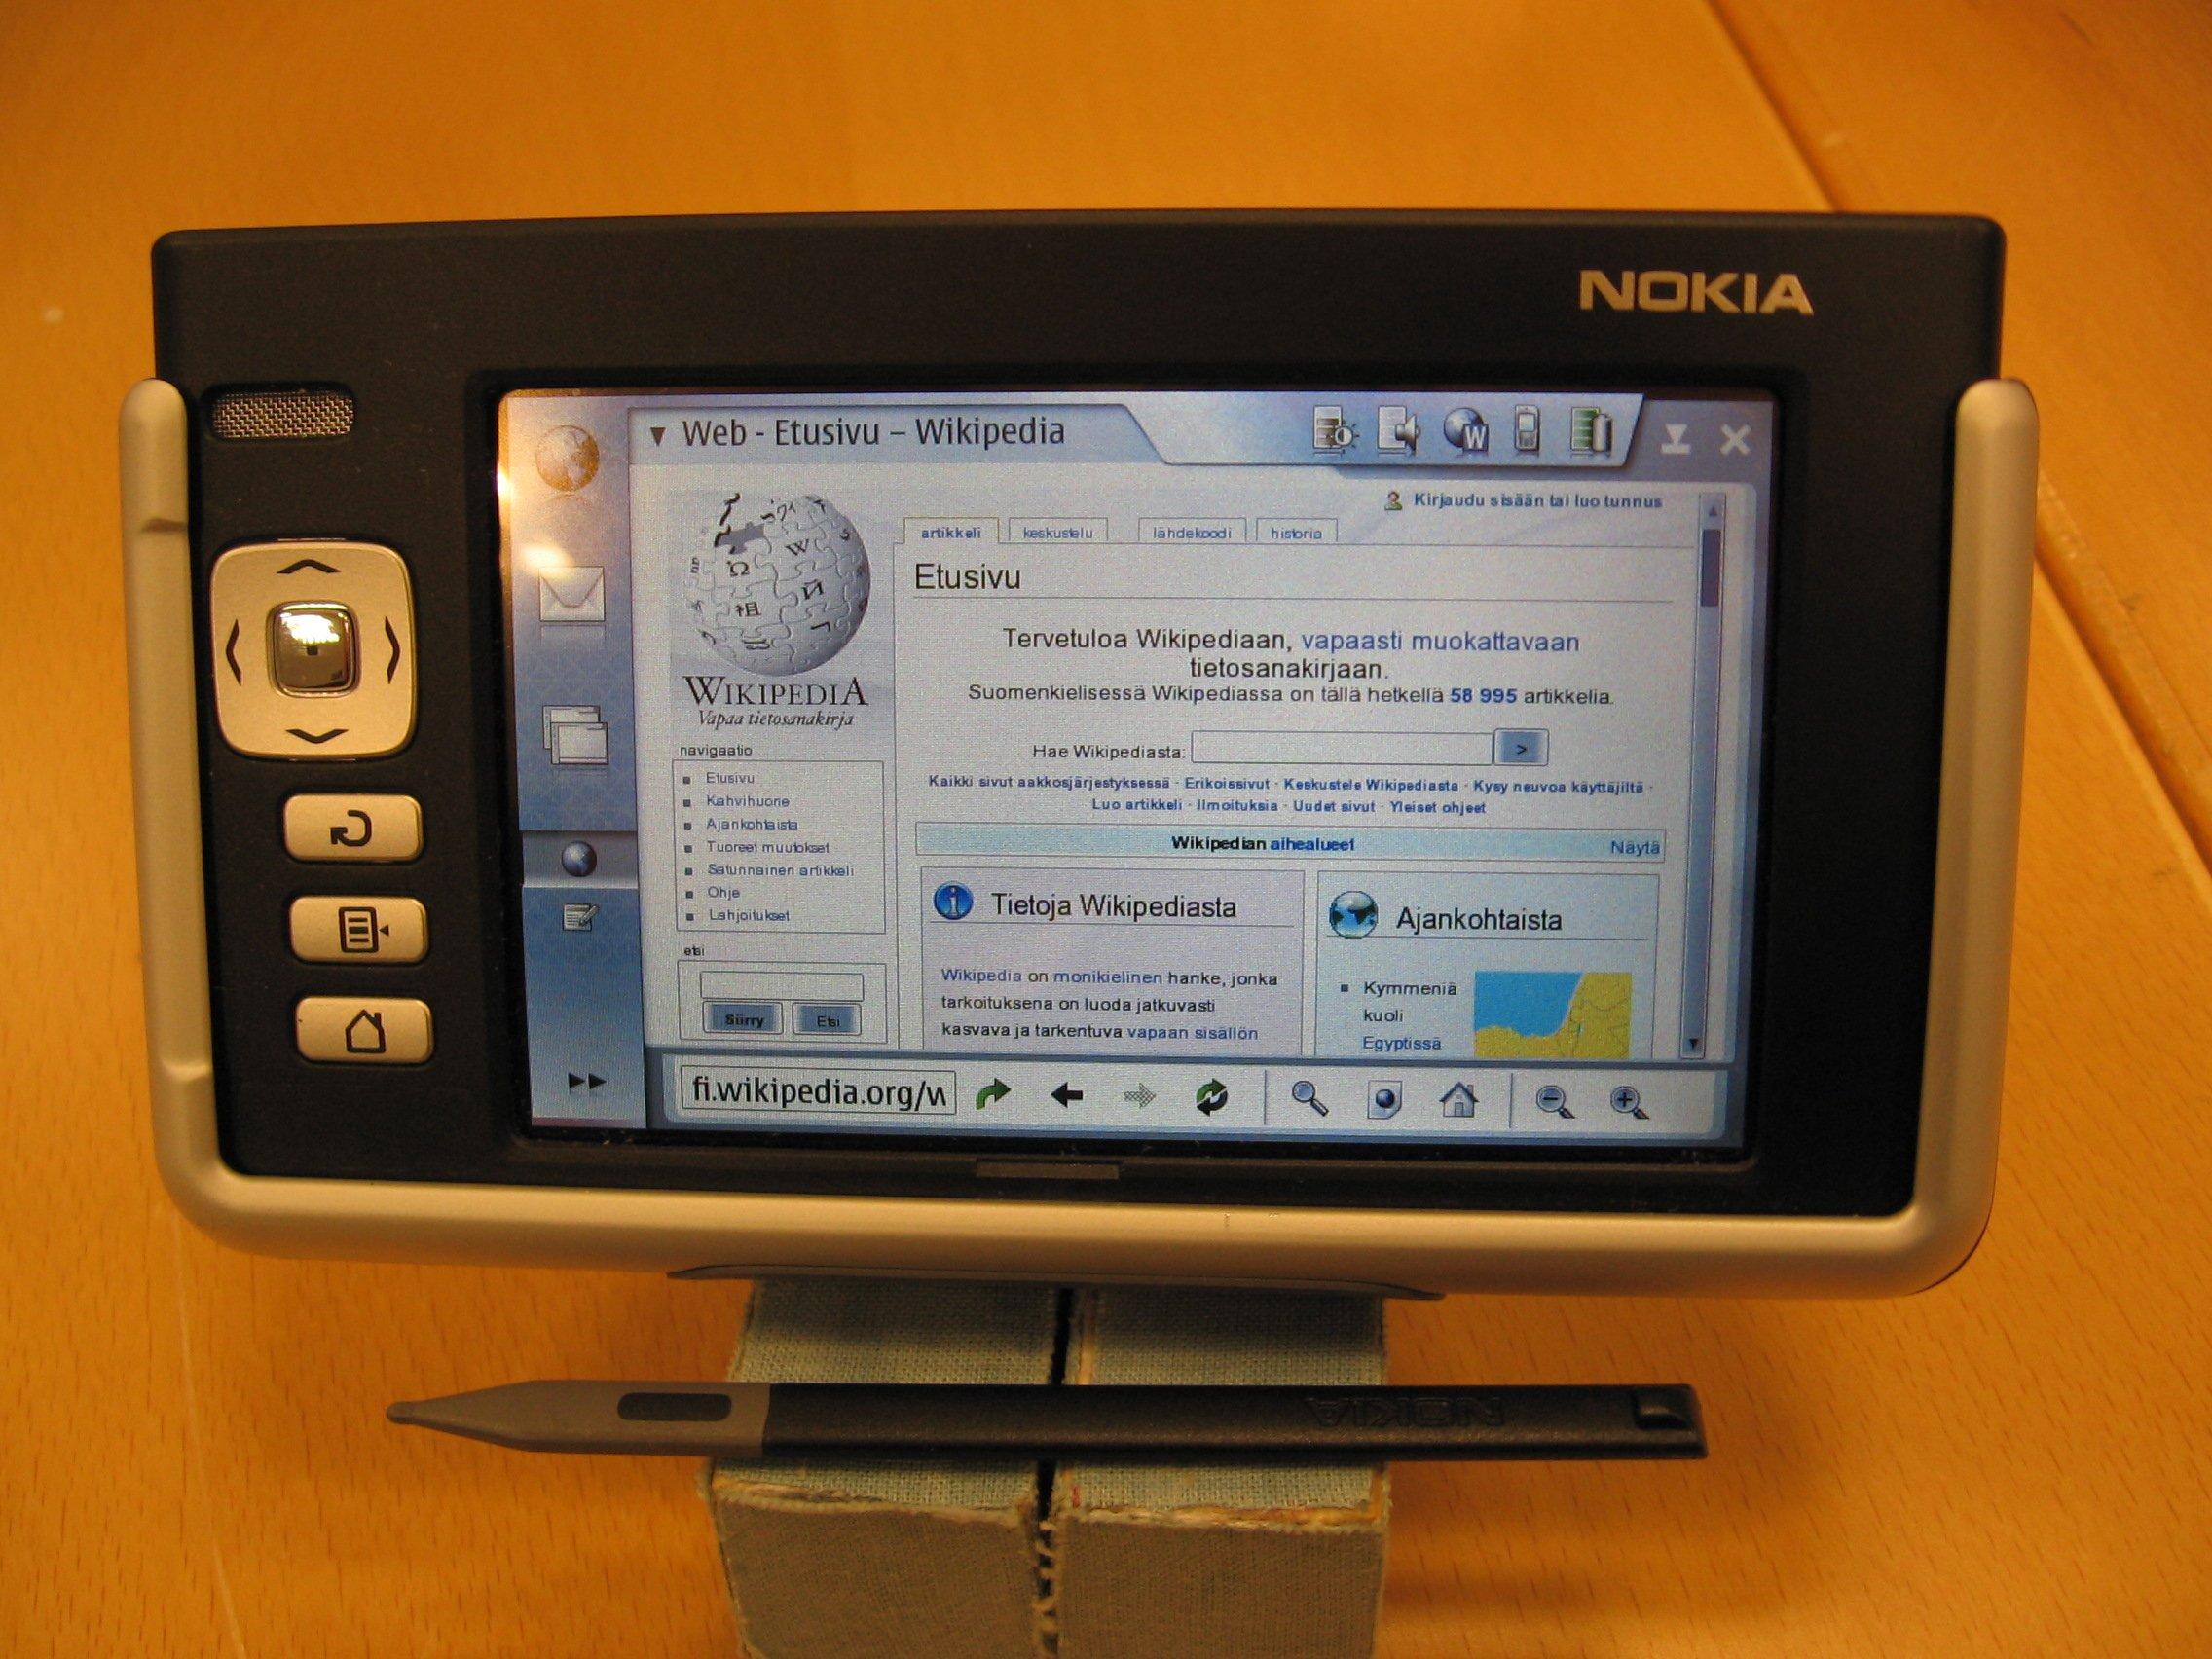 Nokia 7500 Драйвер На Модем